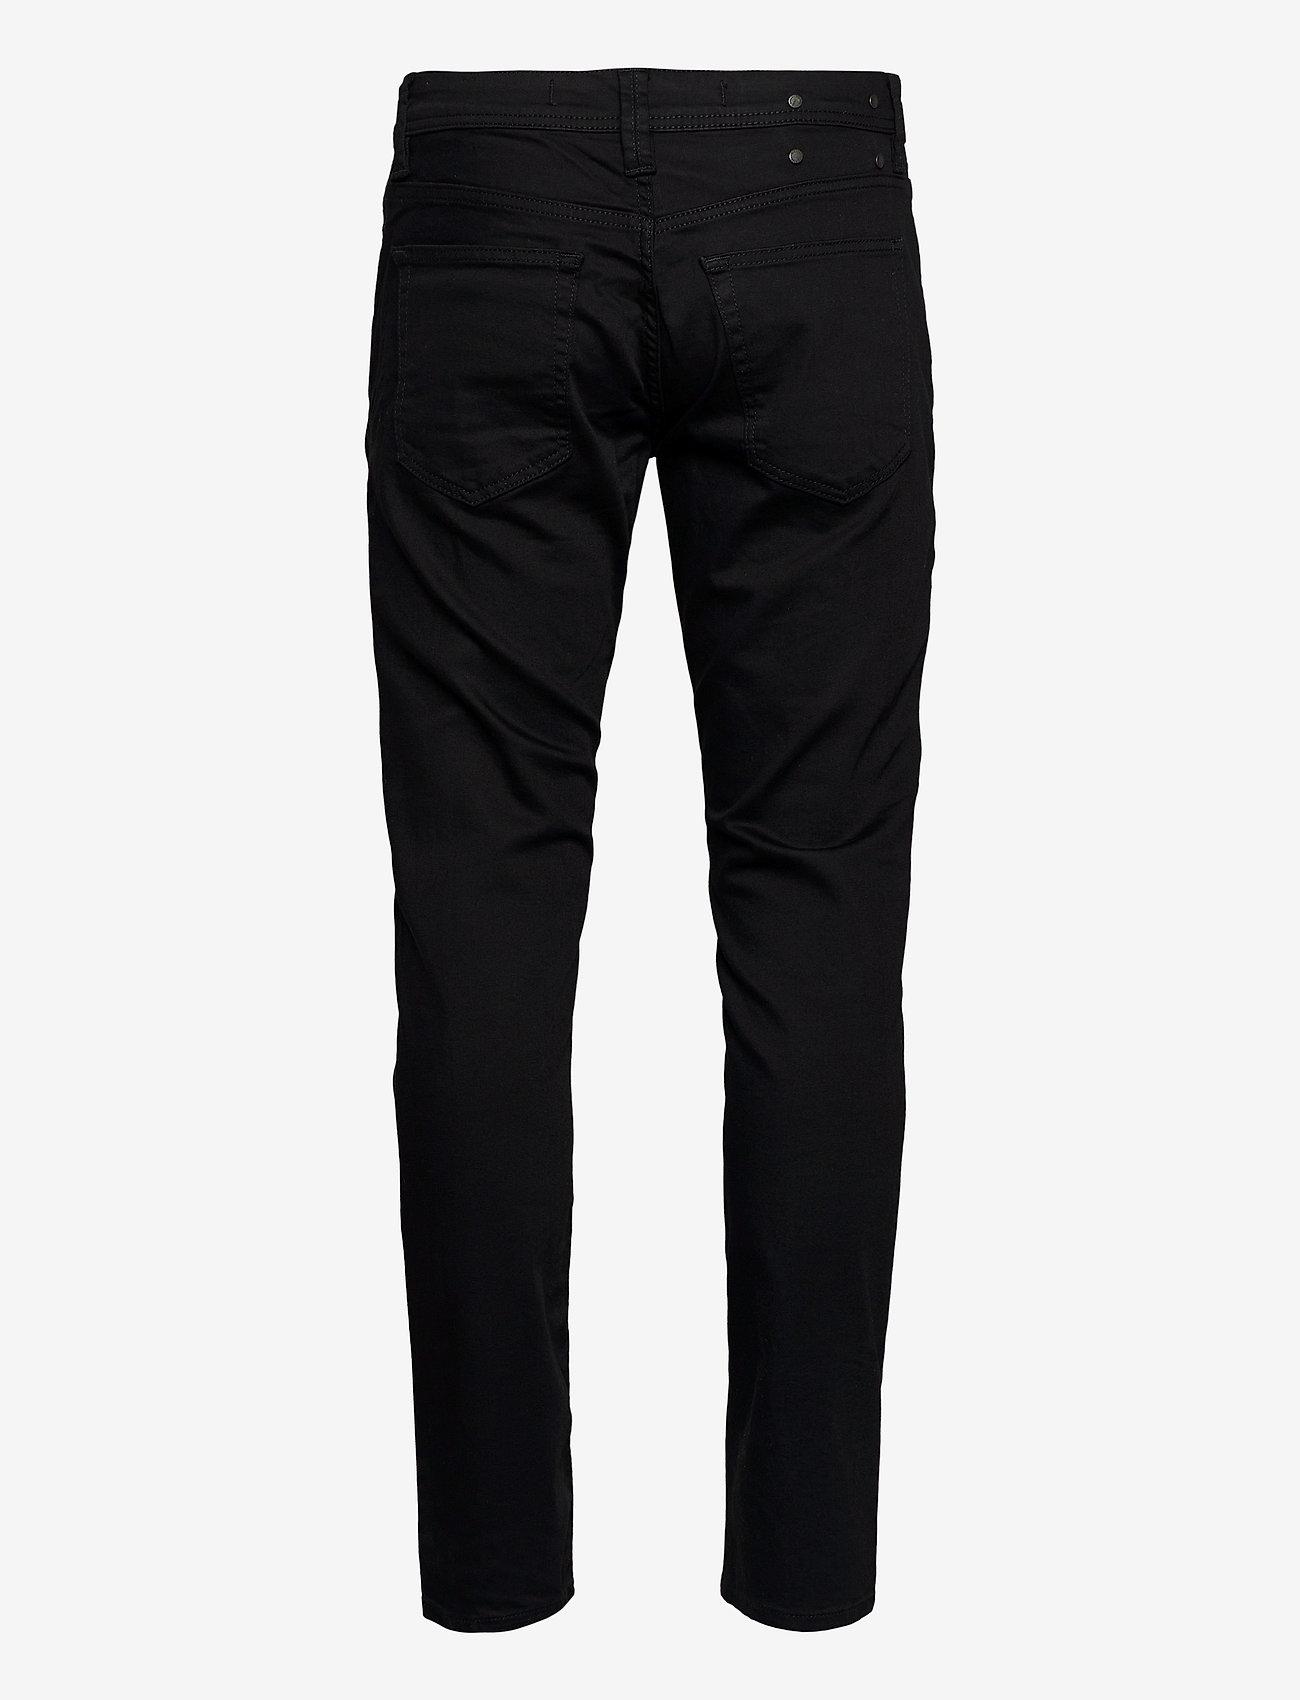 Gabba - Nico Black Night Jeans - regular jeans - rs0775 - 1